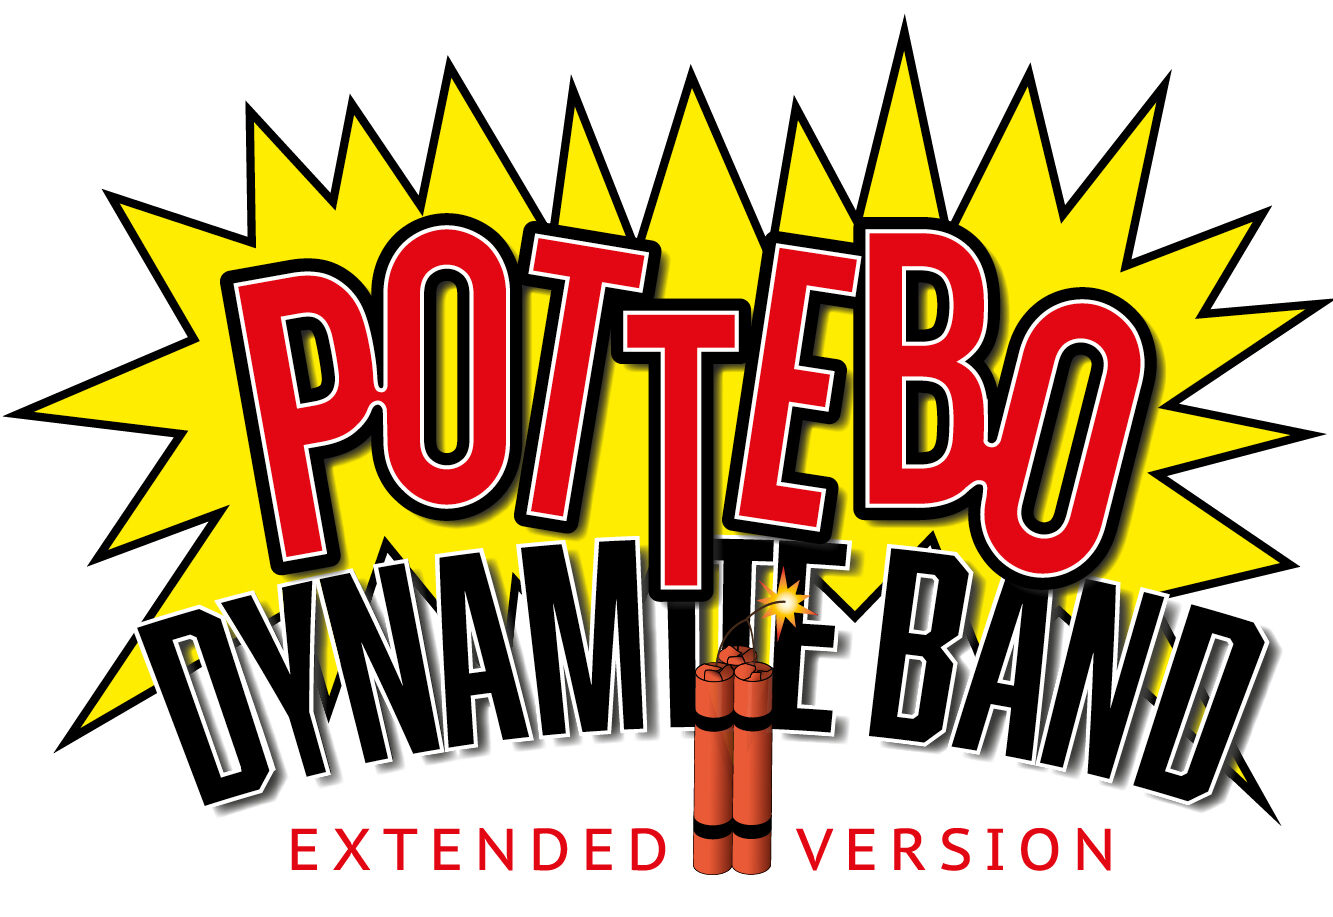 Pottebo Dynamite Band